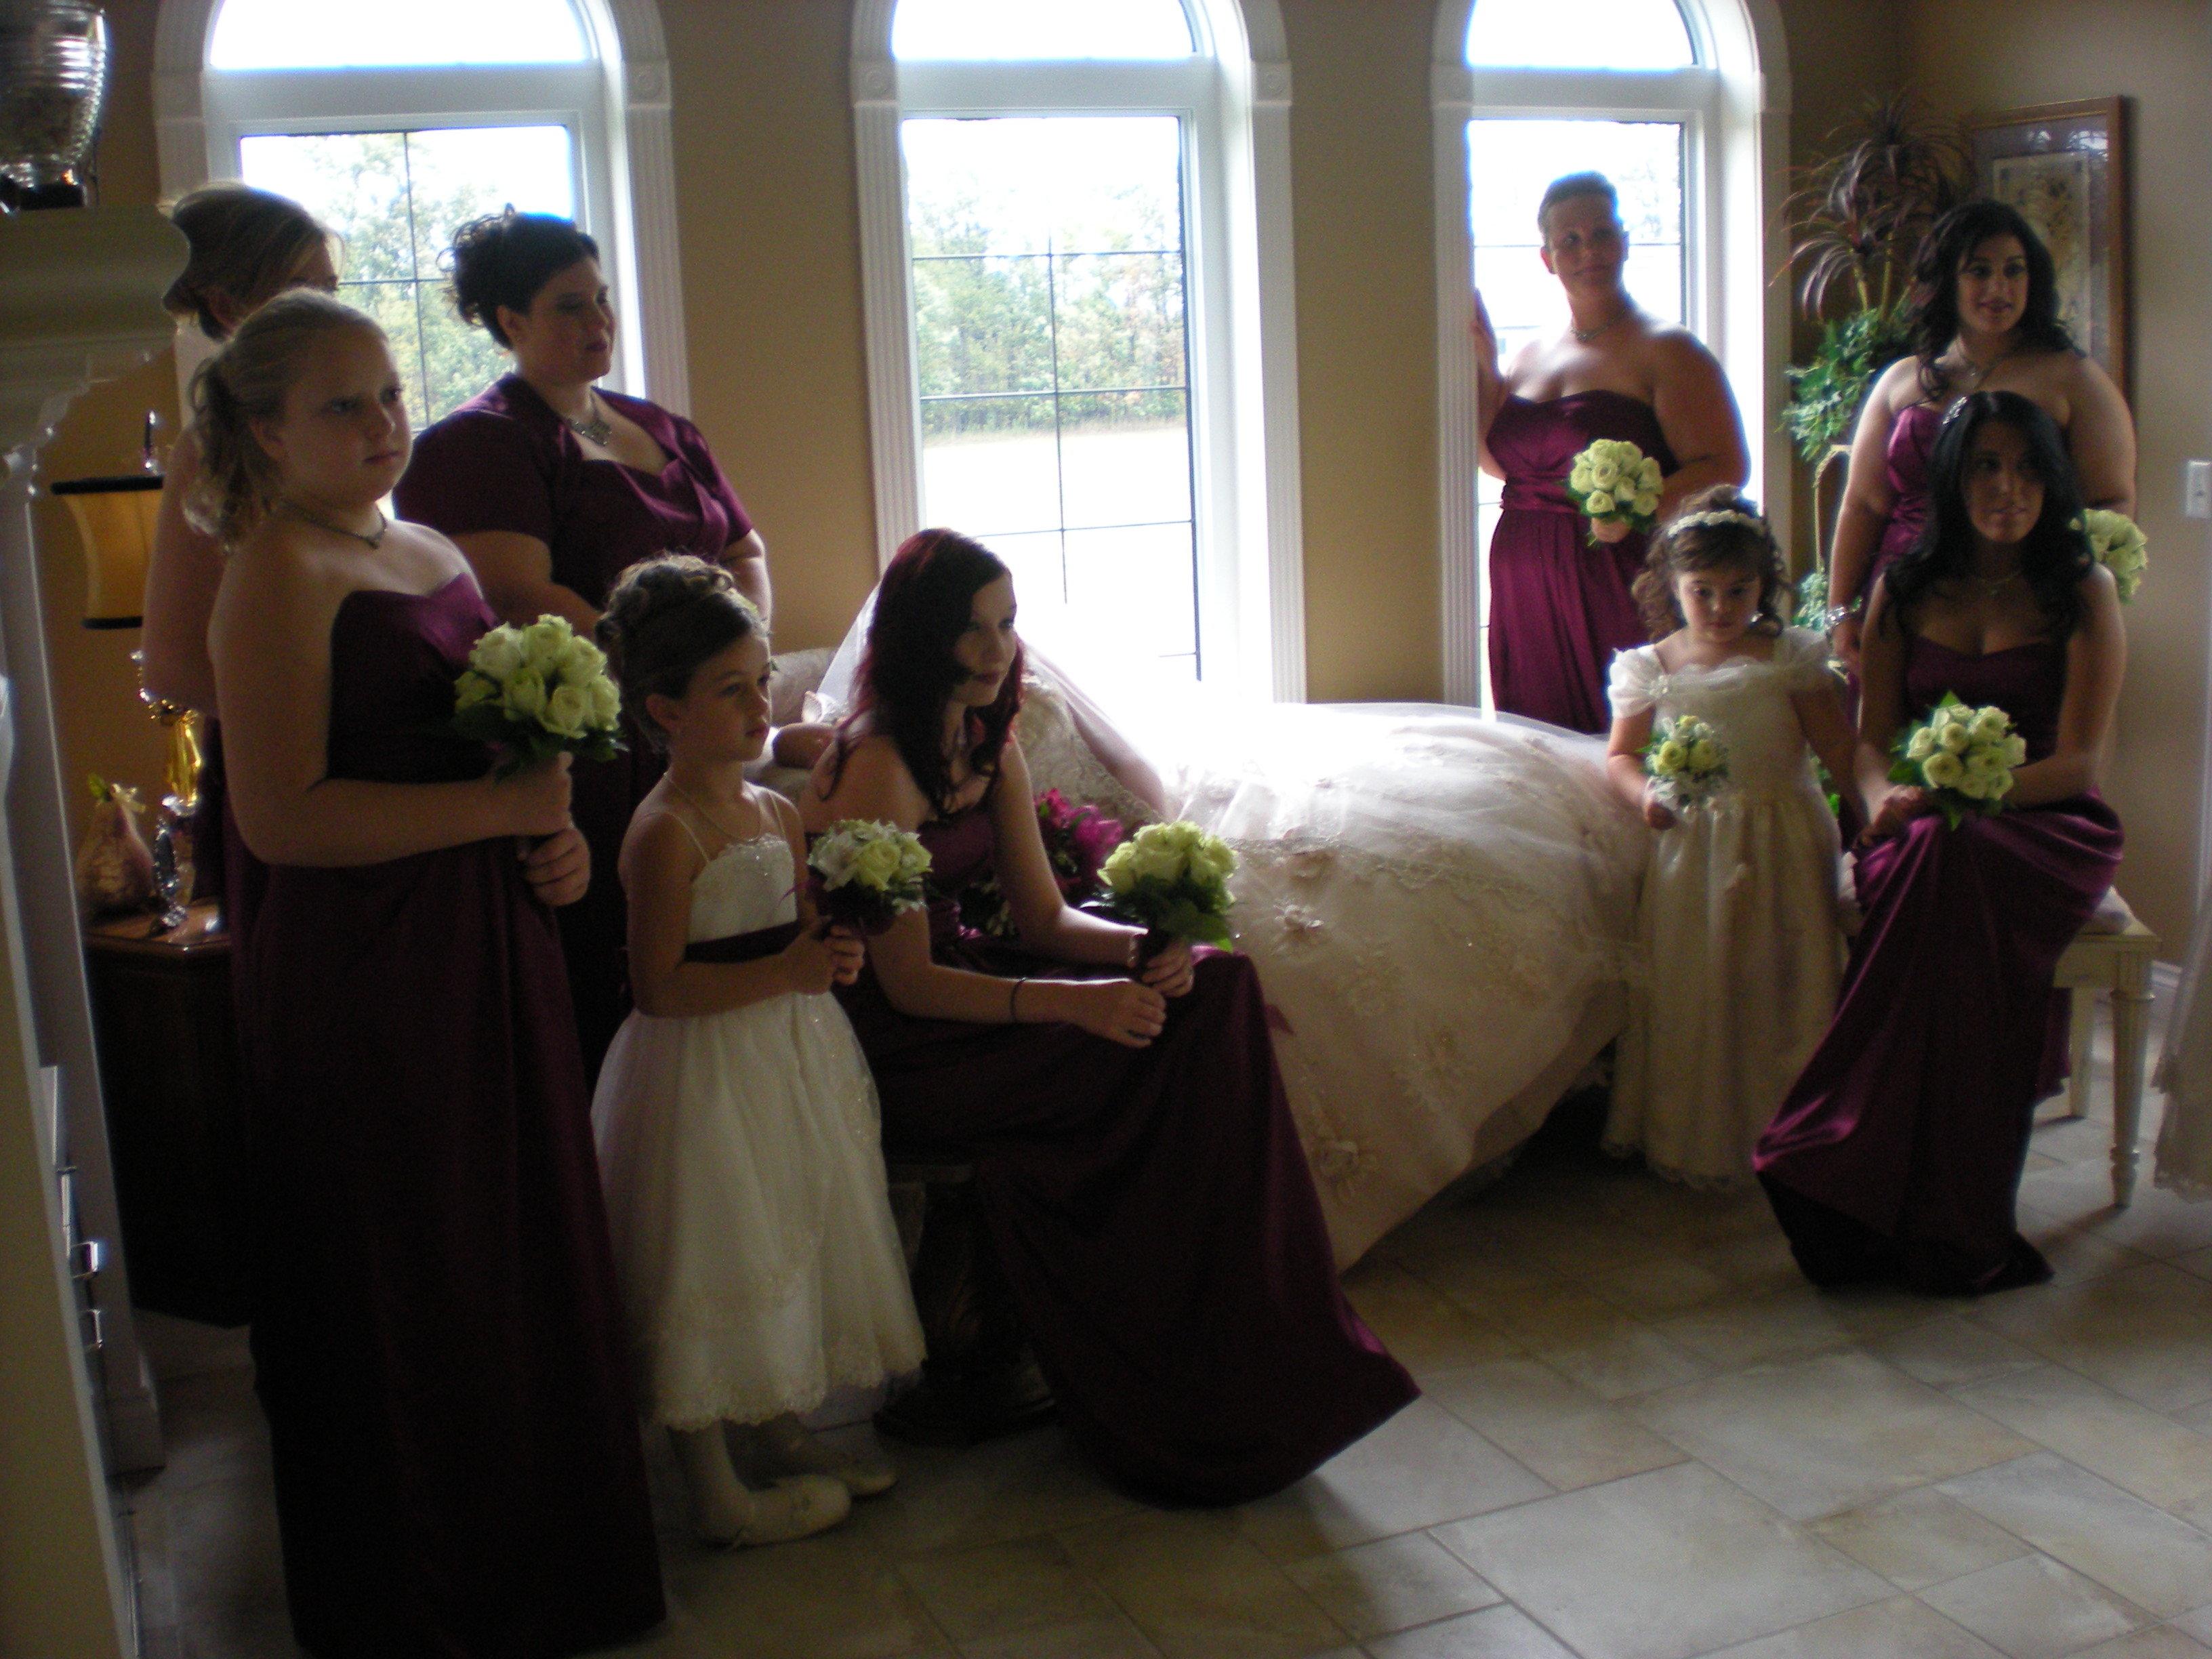 Beauty, Flowers & Decor, Bridesmaids, Bridesmaids Dresses, Flower Girls, Fashion, purple, Bridesmaid Bouquets, Flowers, Hair, Flower girl, Bouquets, Flower Wedding Dresses